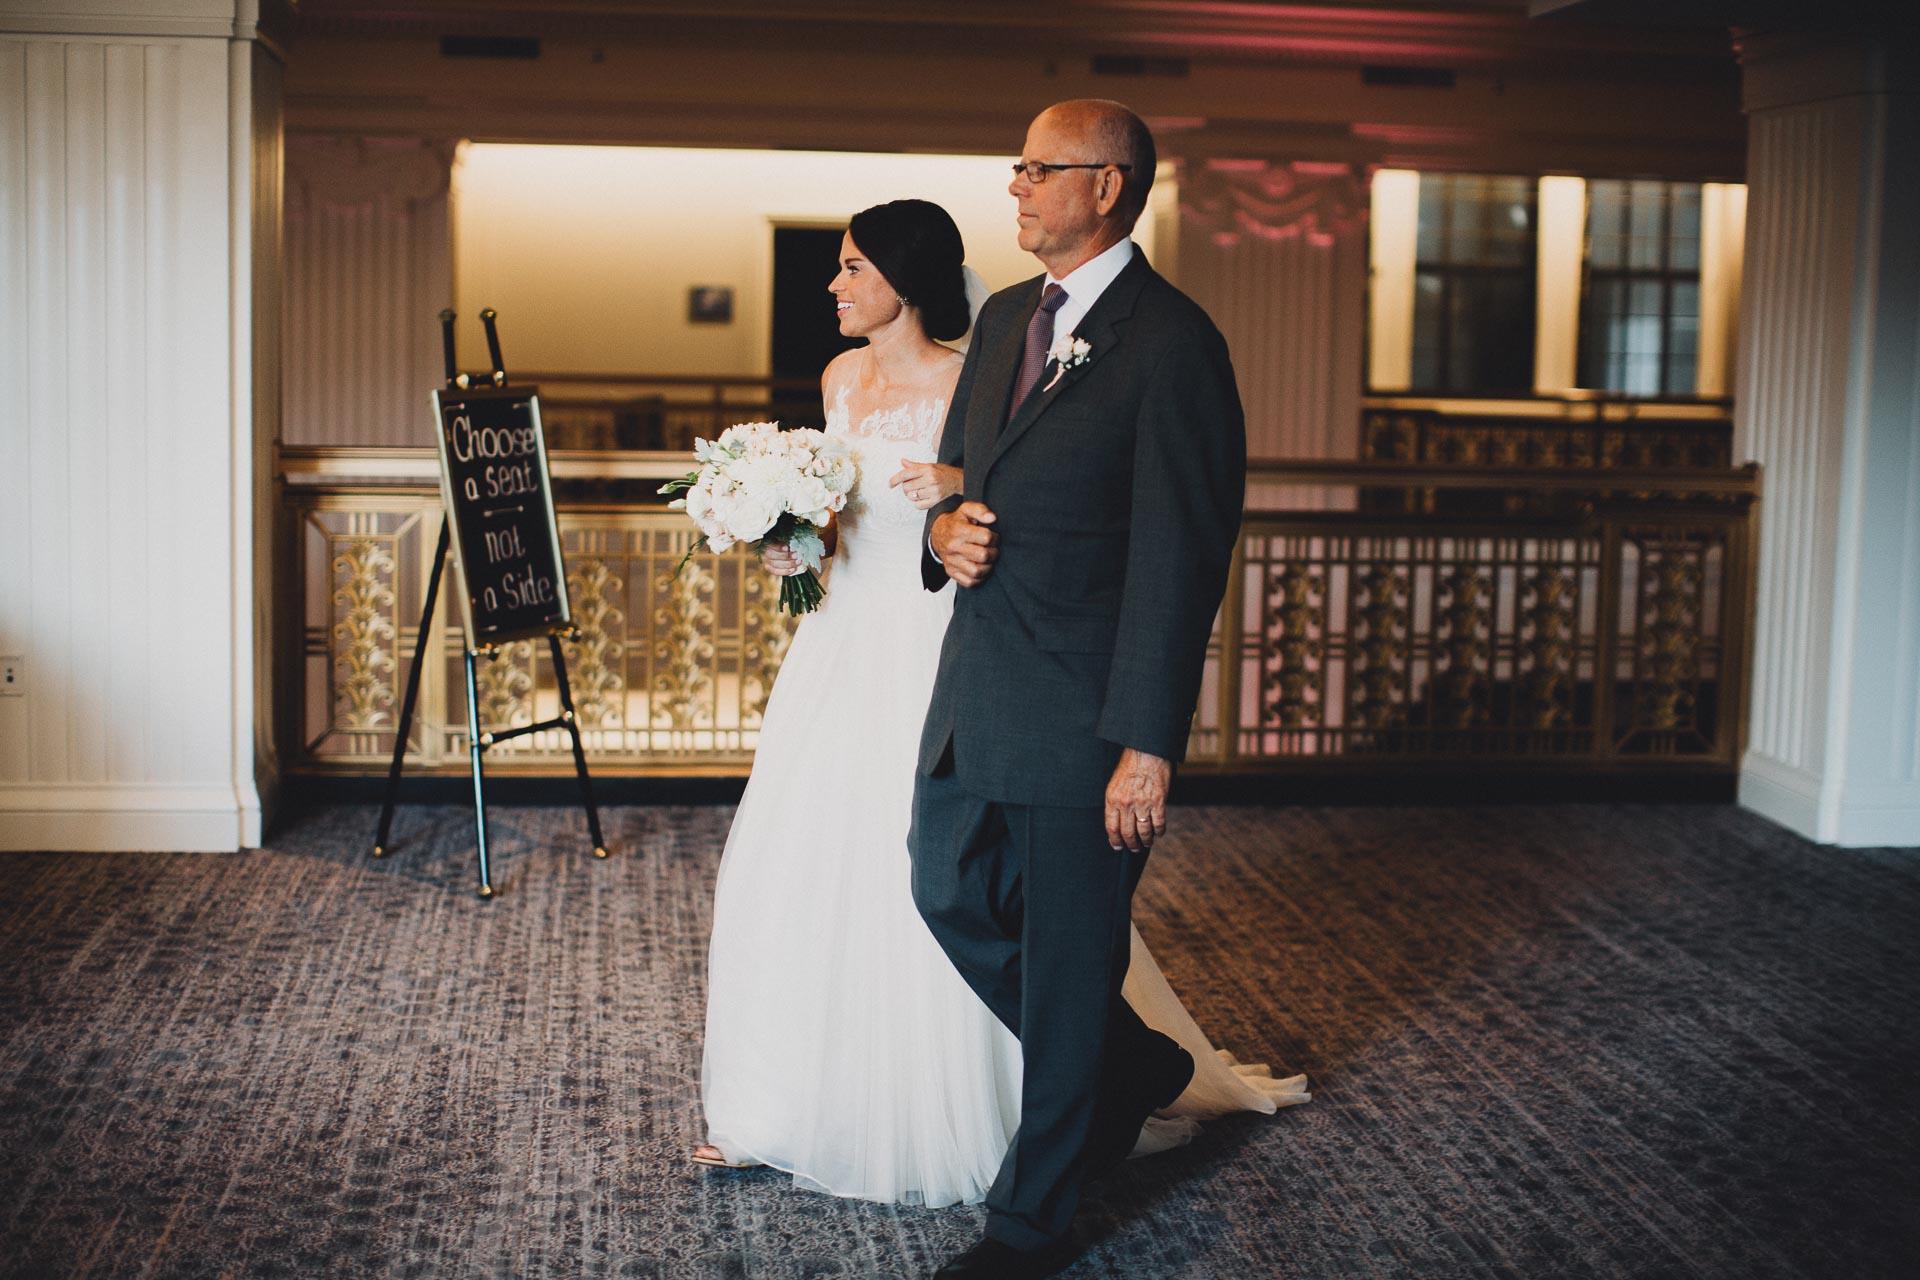 Emily-Eddie-Cincinnati-Rennaissance-Hotel-Wedding-081@2x.jpg